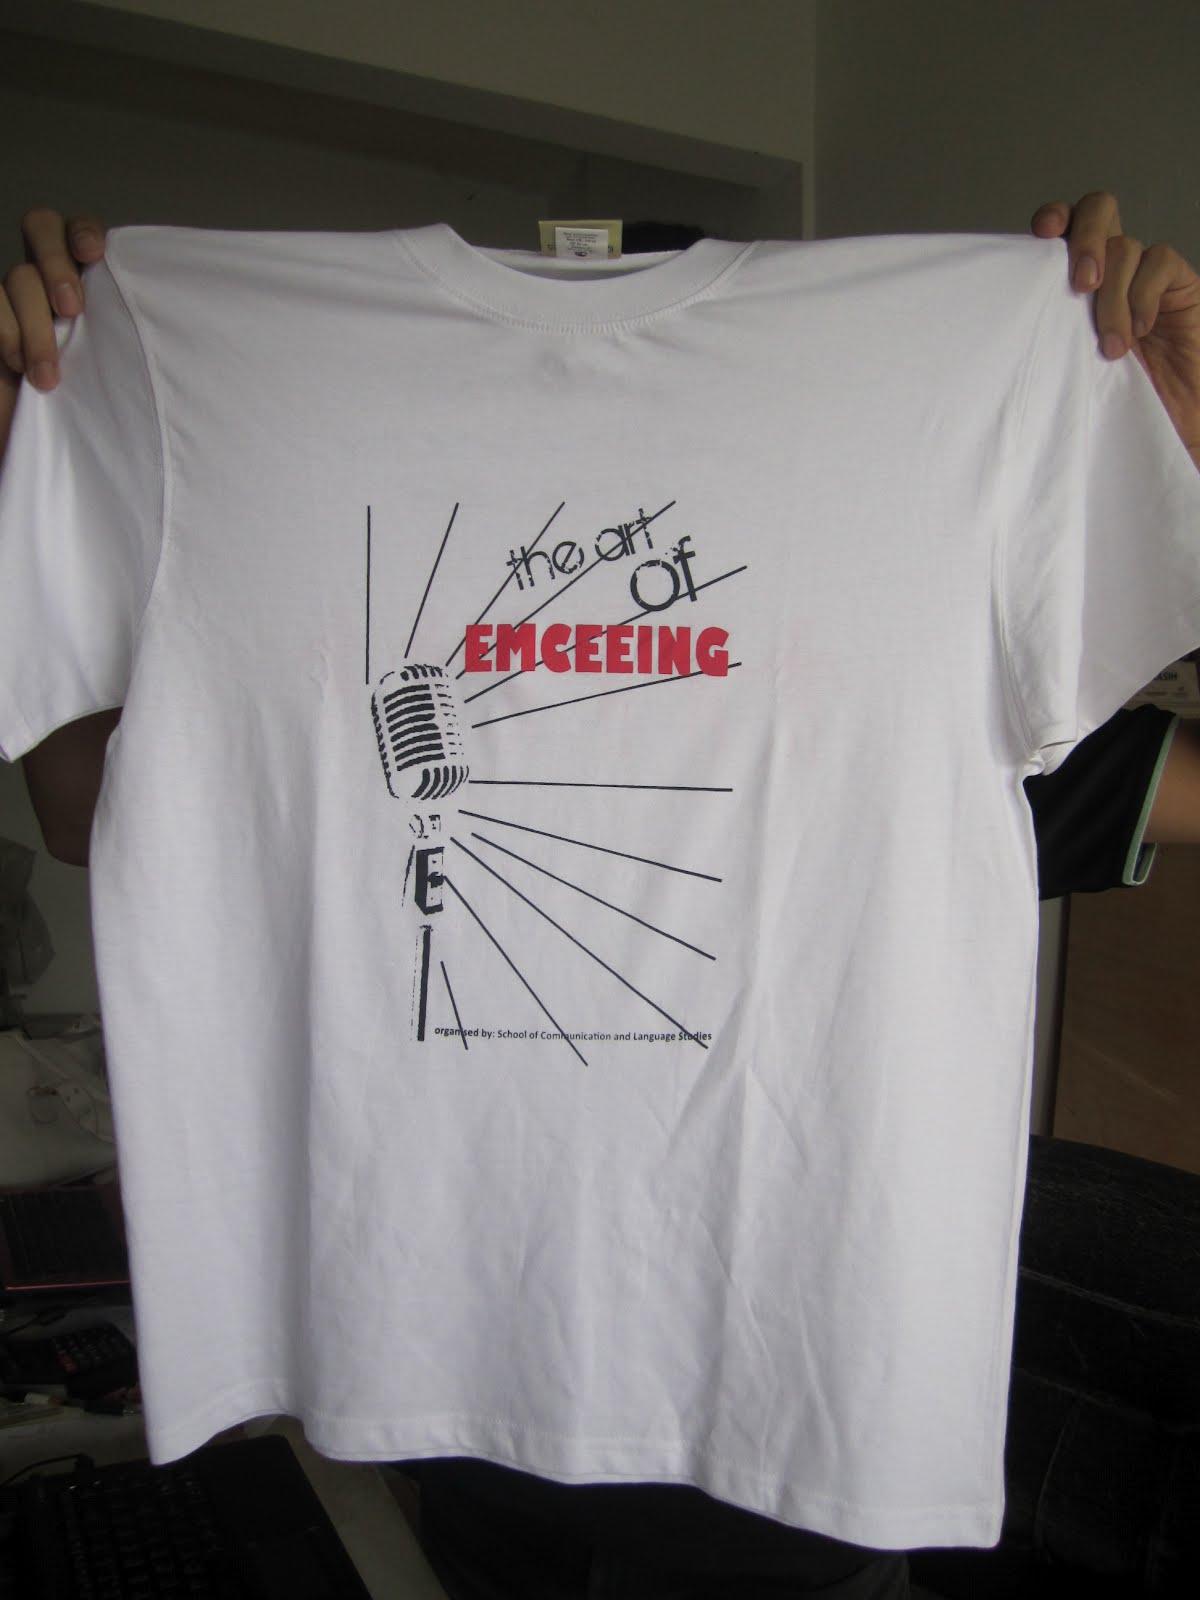 All you can print t shirt silkscreen printing for Where can i print t shirts